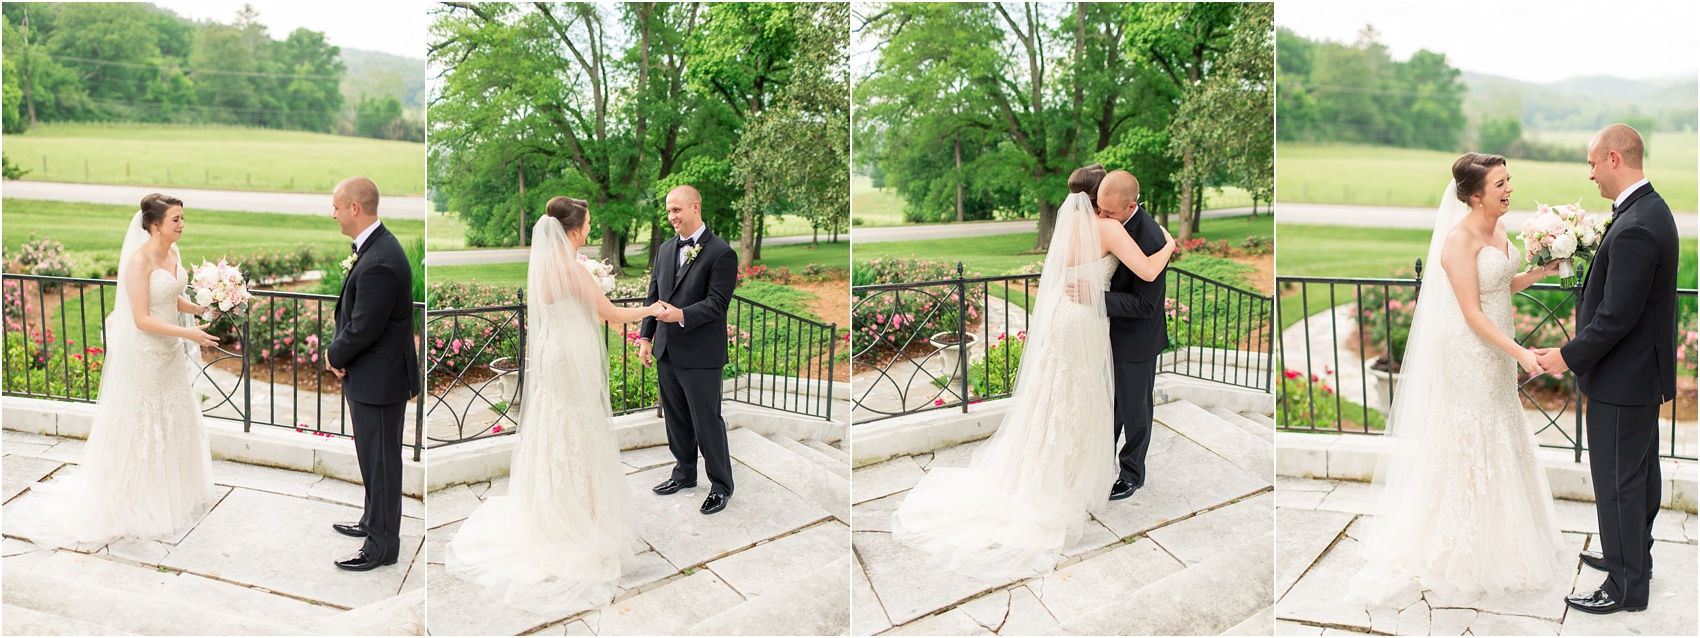 Savannah Eve Photography- Nutt Wedding- Blog-24.jpg